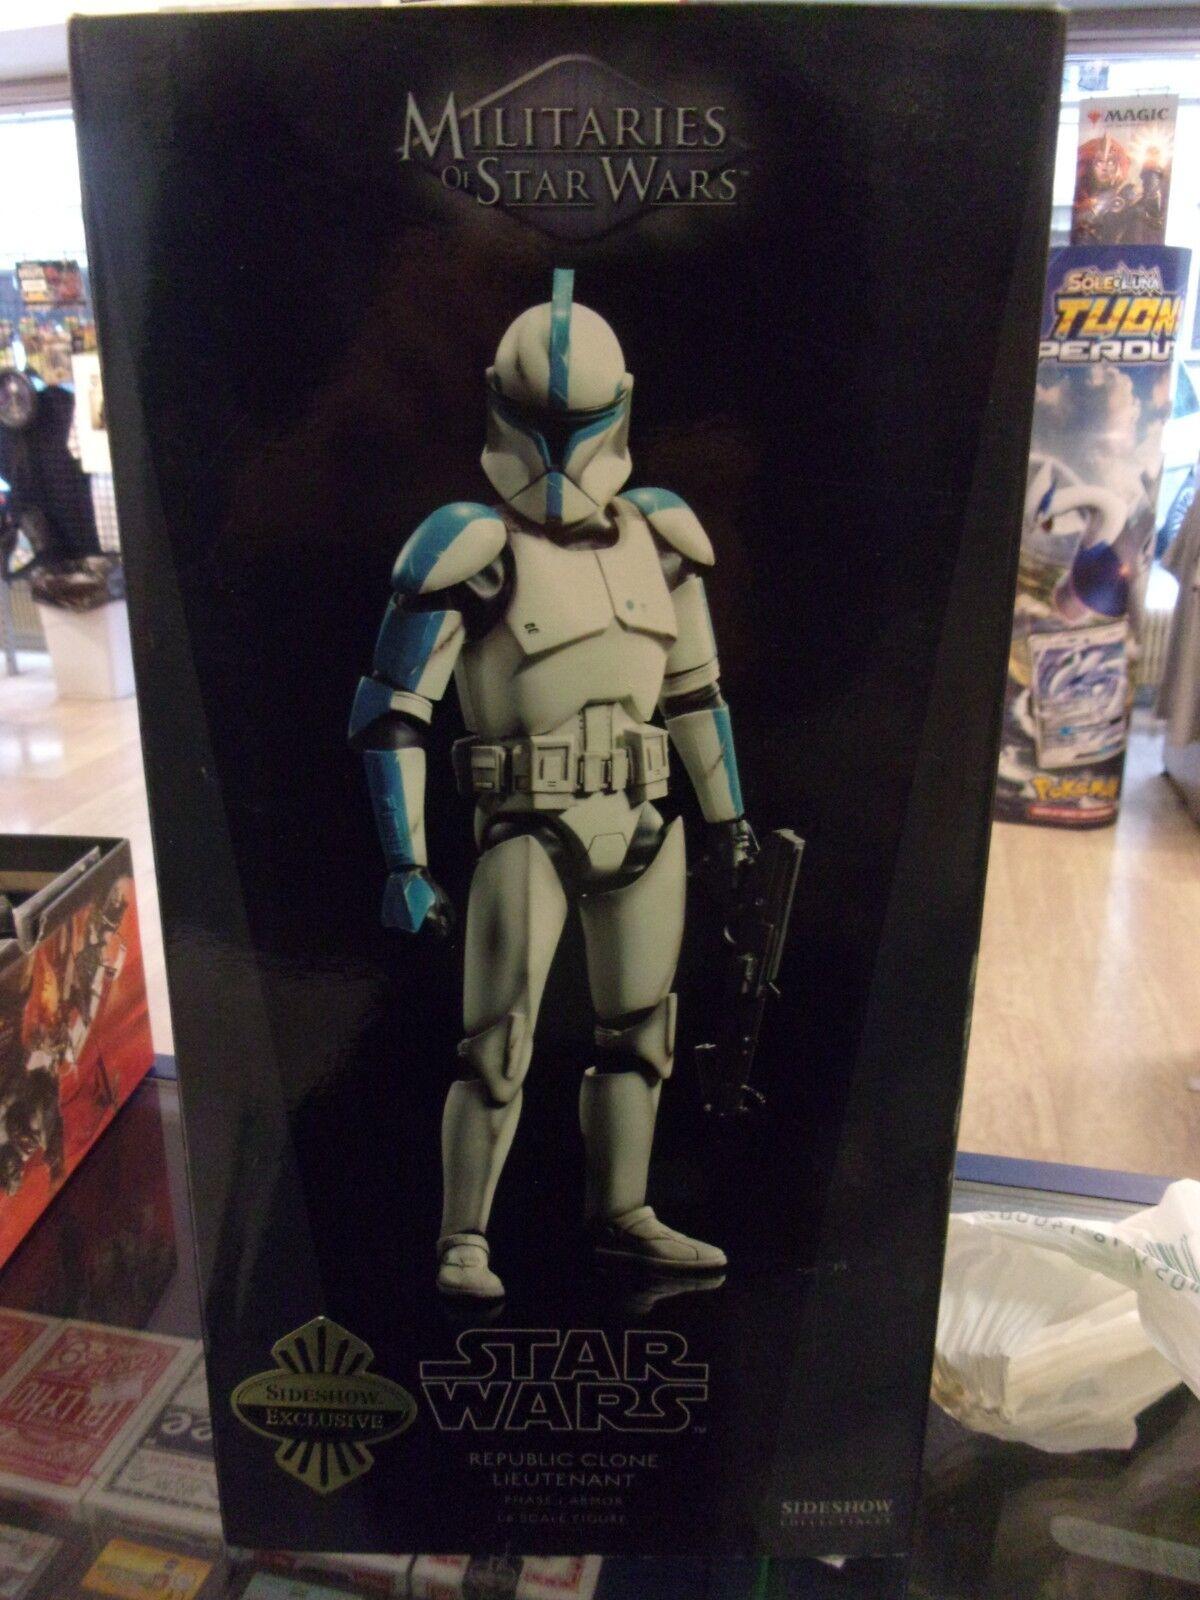 Sideshow Star Wars Clone Lieutenant Militaries of Star Wars 1 6 SCALE